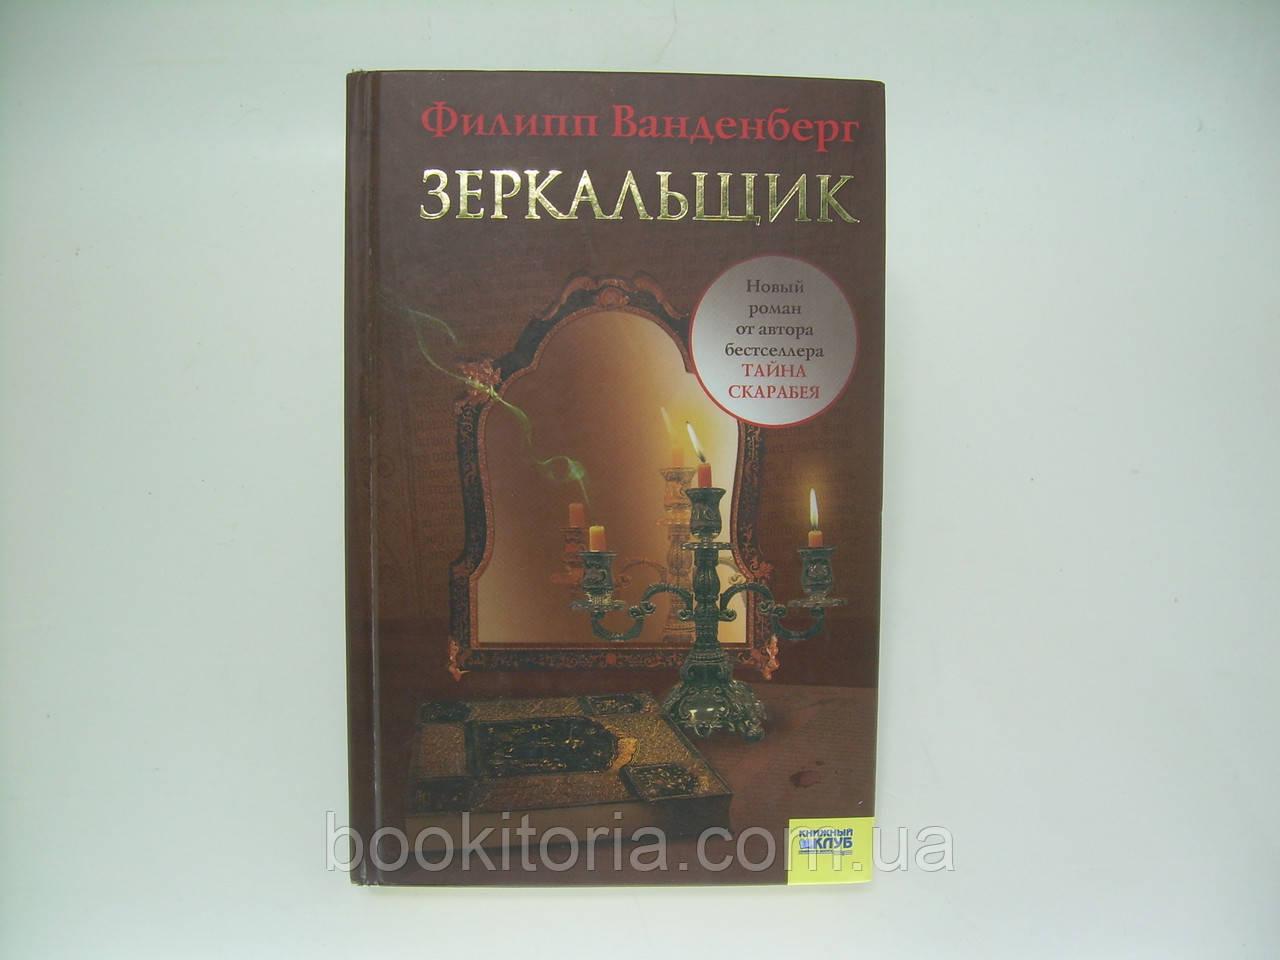 Ванденберг Ф. Зеркальщик (б/у).